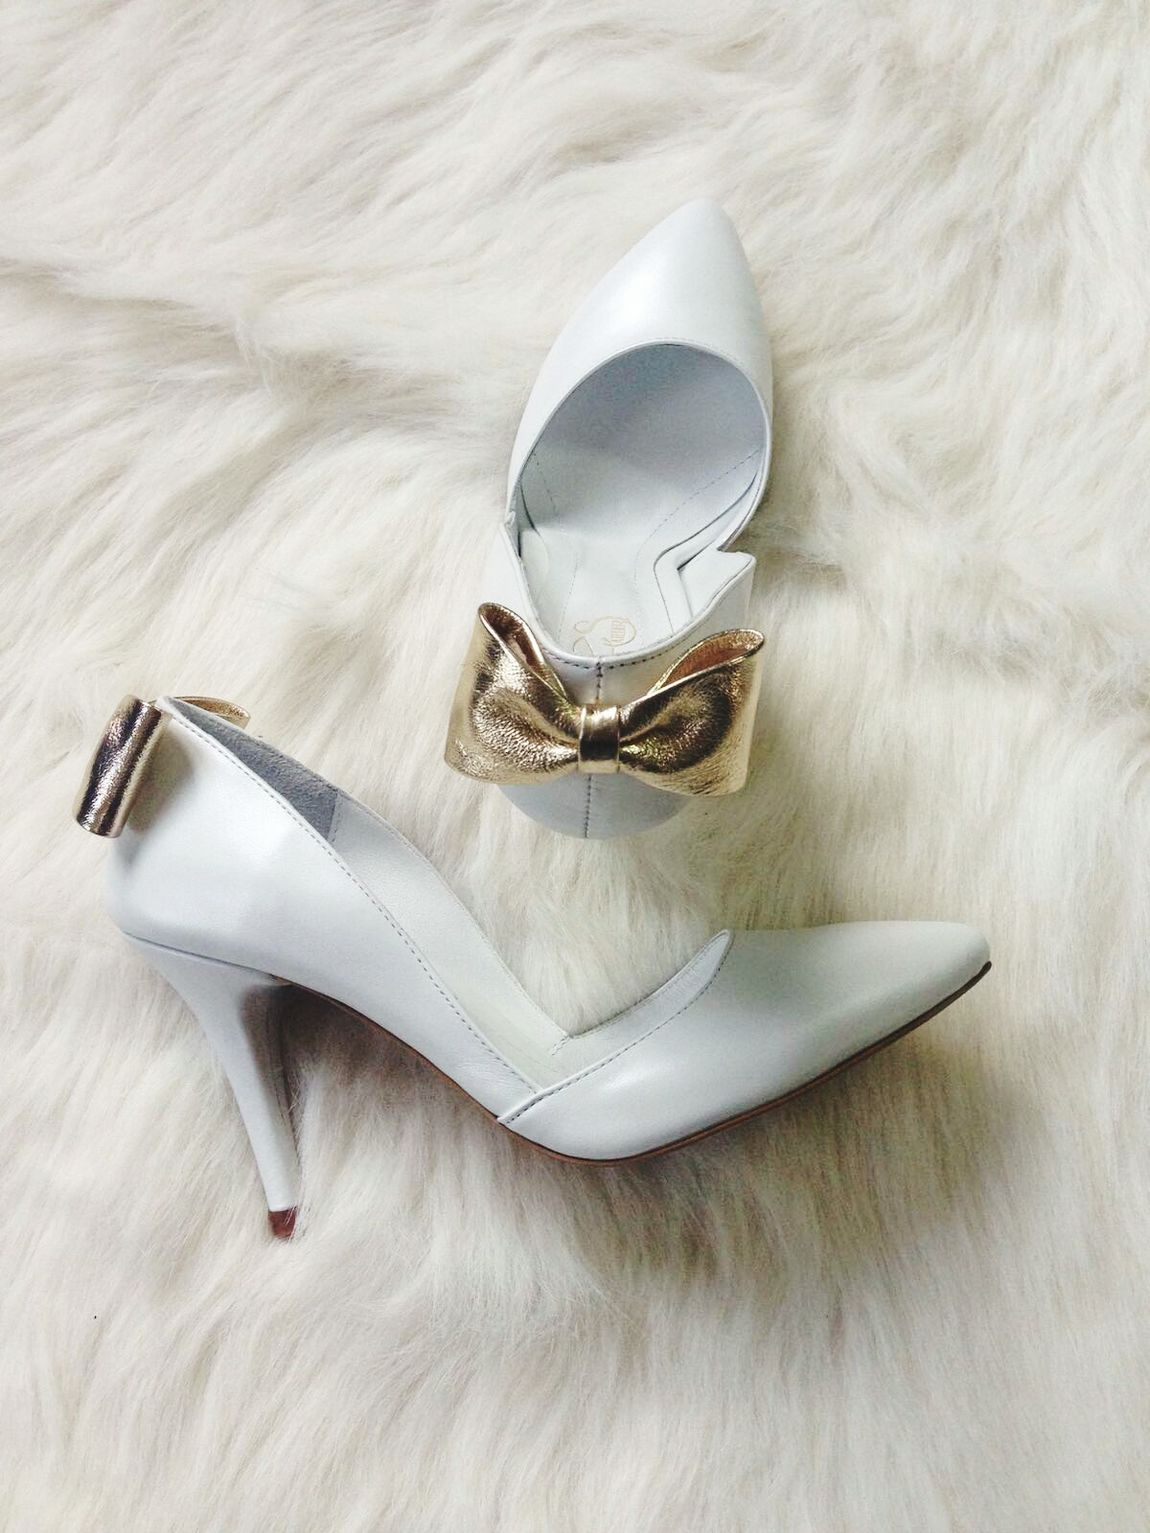 Shoes Wedding Weddingshoes Bride Brideshoes